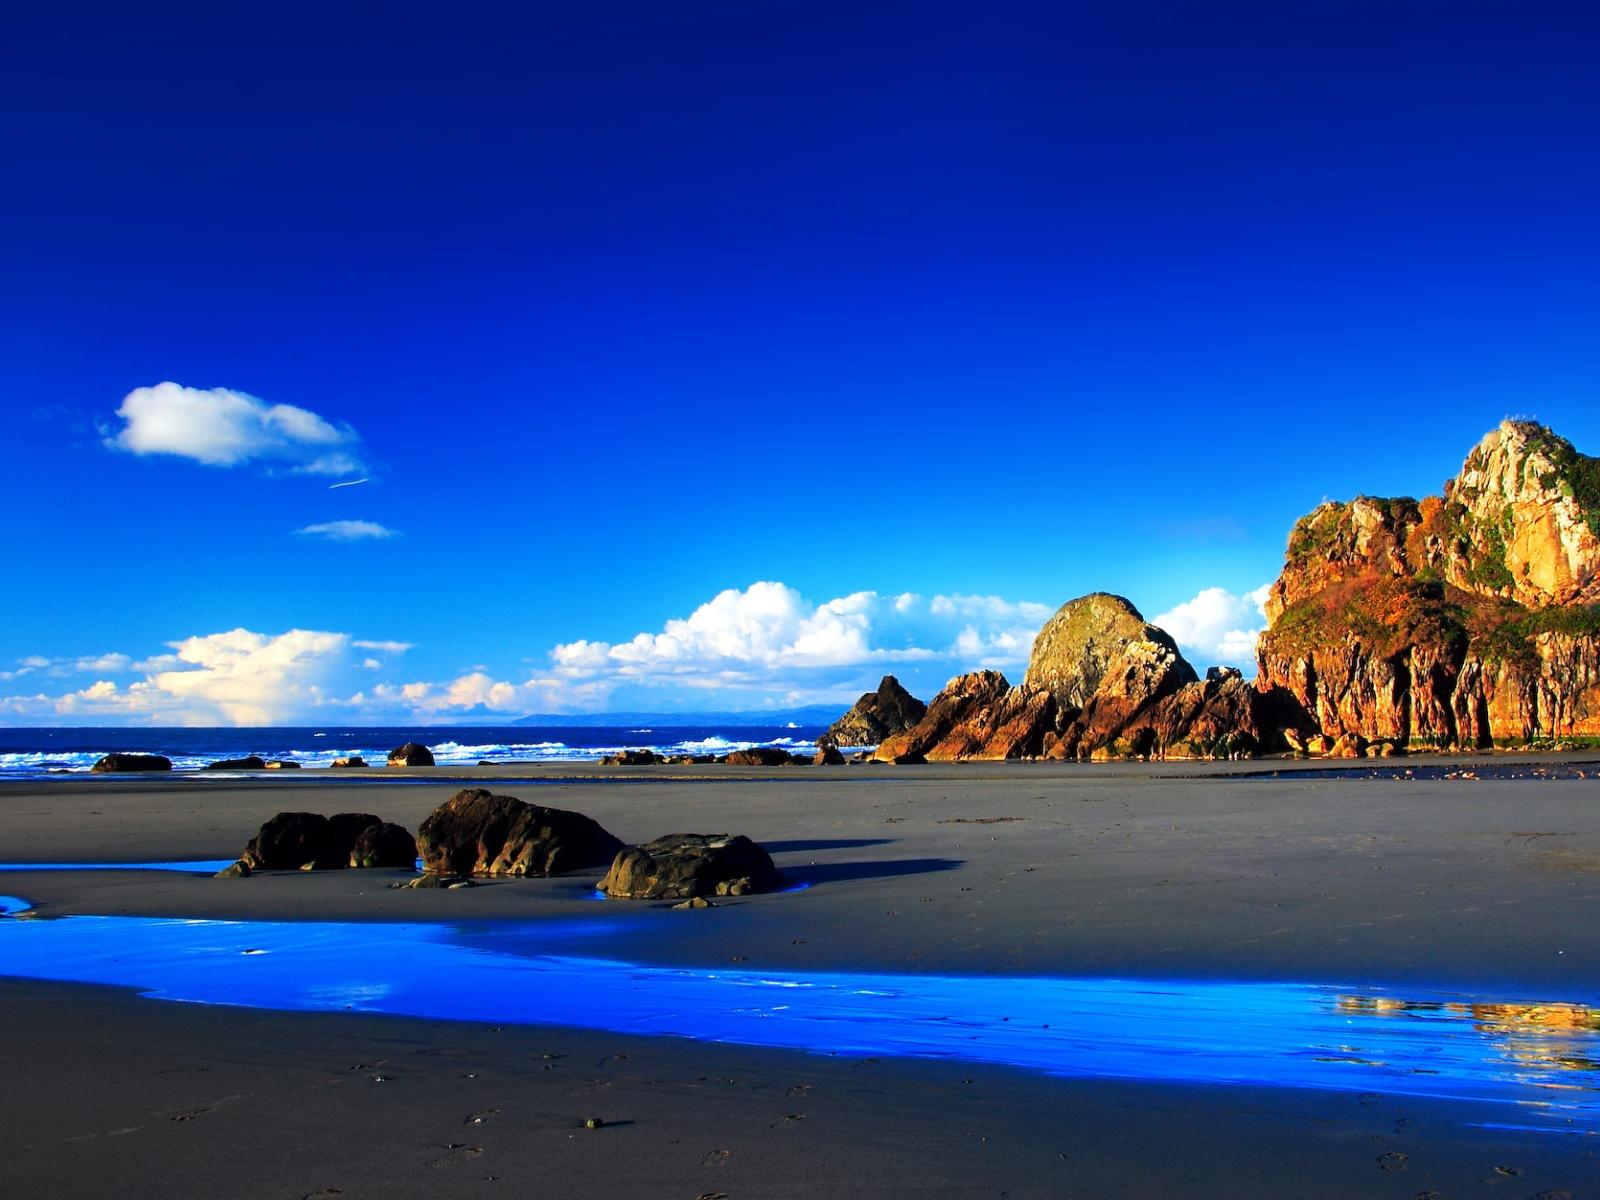 nature landscape beautiful images top desktop nature hd wallpapers 1600x1200